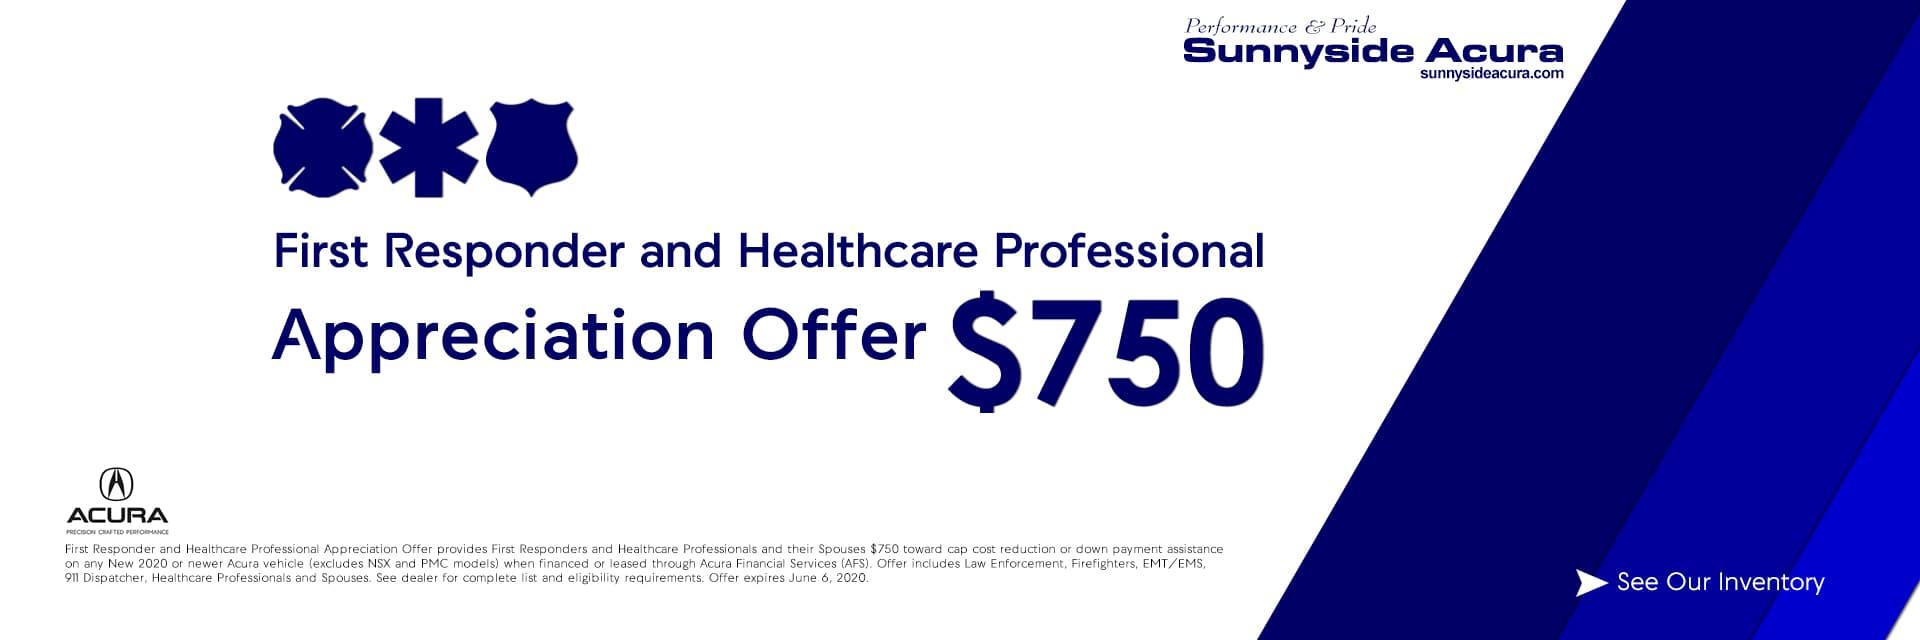 First Responder and Healthcare Professional Appreciation Offer Sunnyside Acura Nashua NH 03063